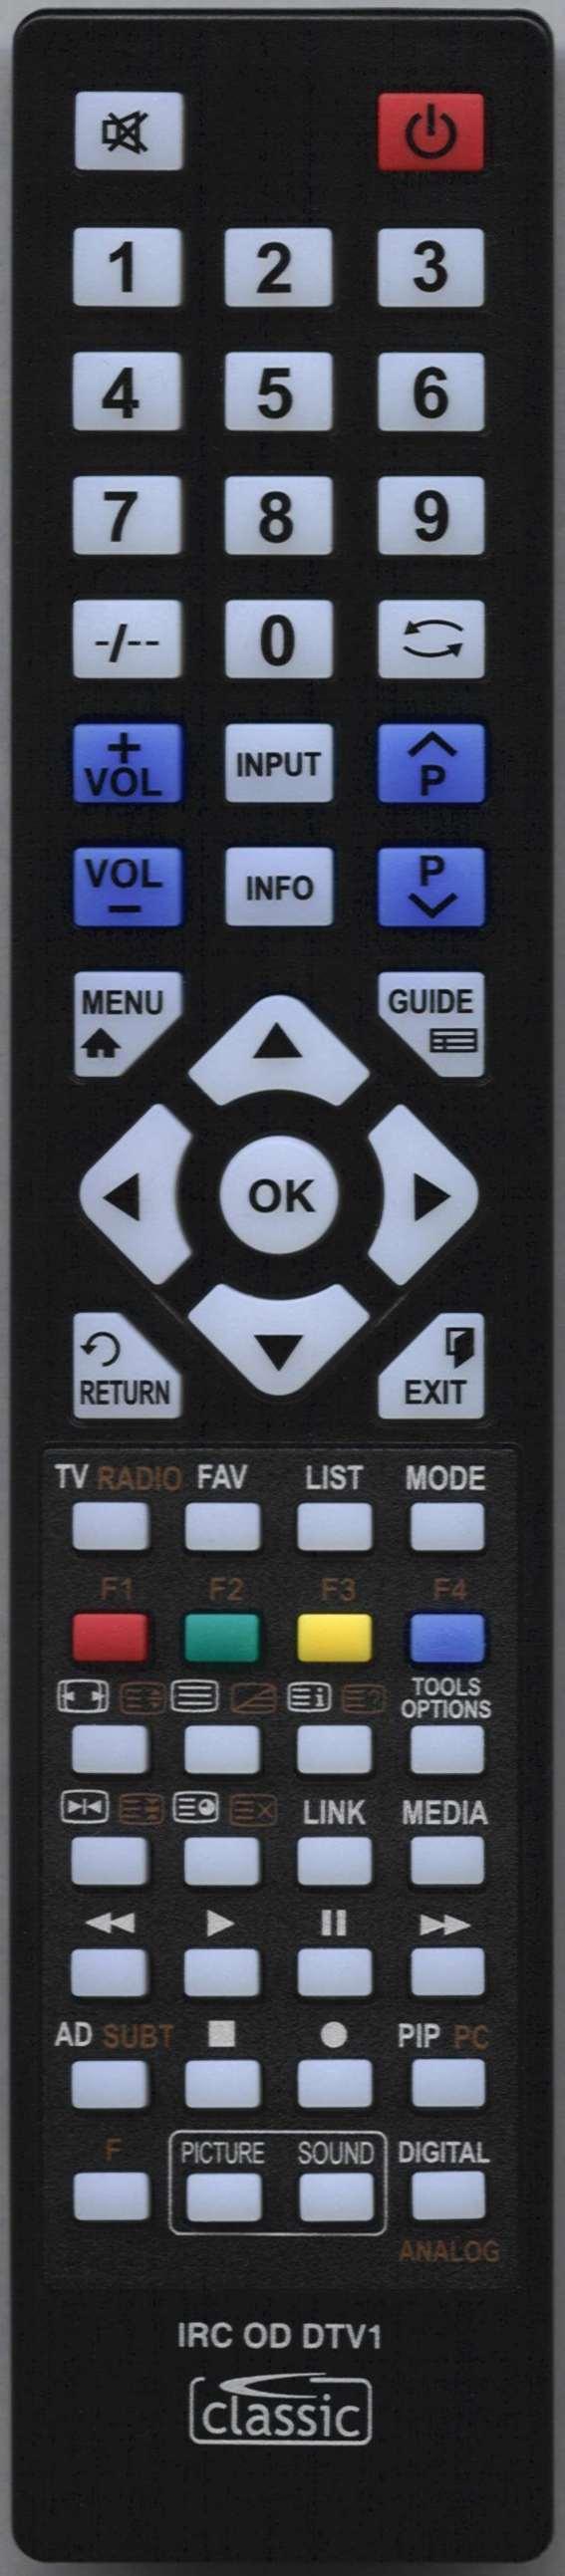 WHARFEDALE L19T11W-C Remote Control